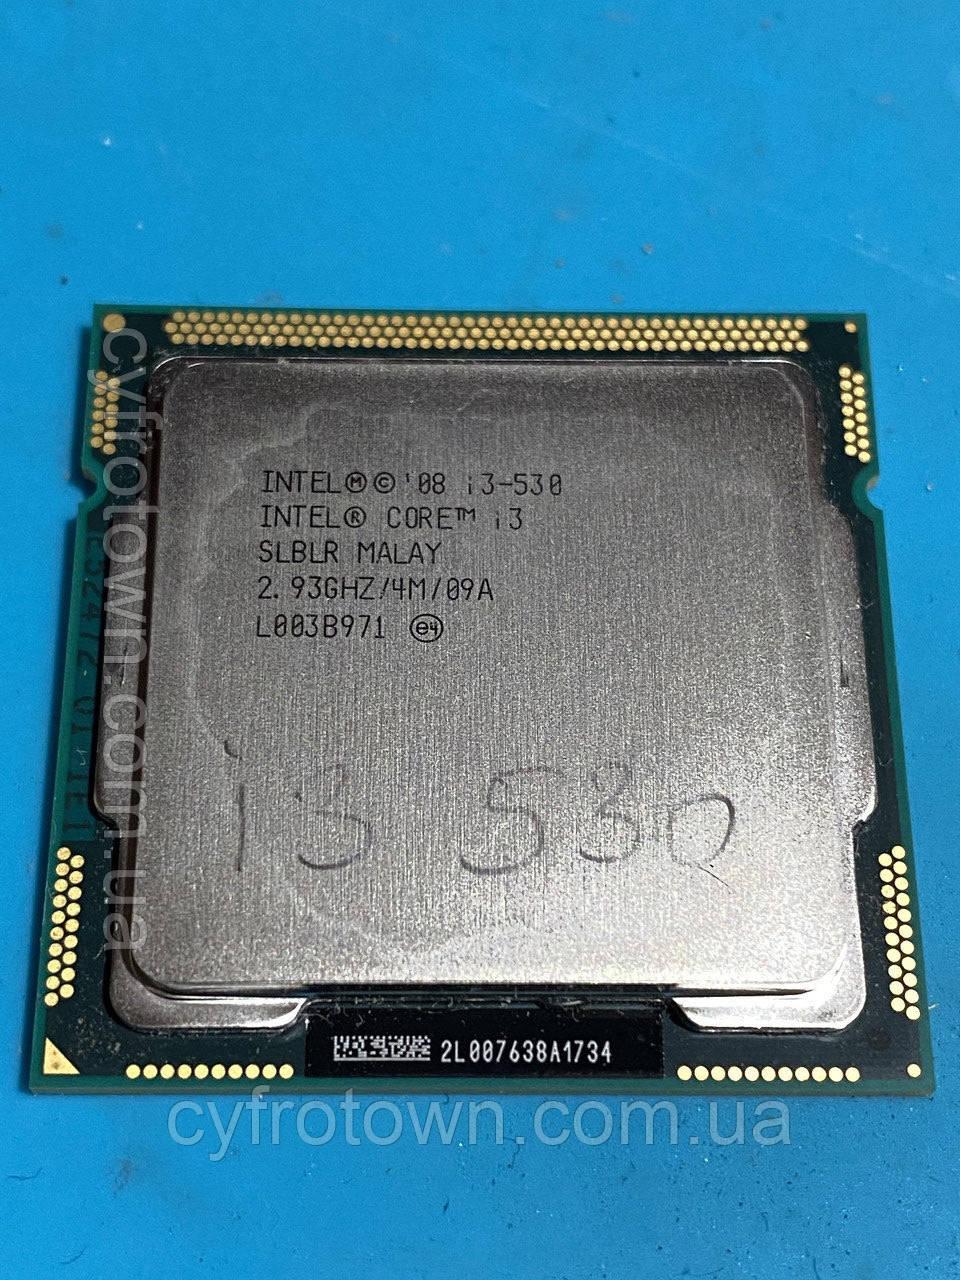 Процесор Intel Core i3 530 2(4)x2.93GHz 4m cache s1156 бо для ПК